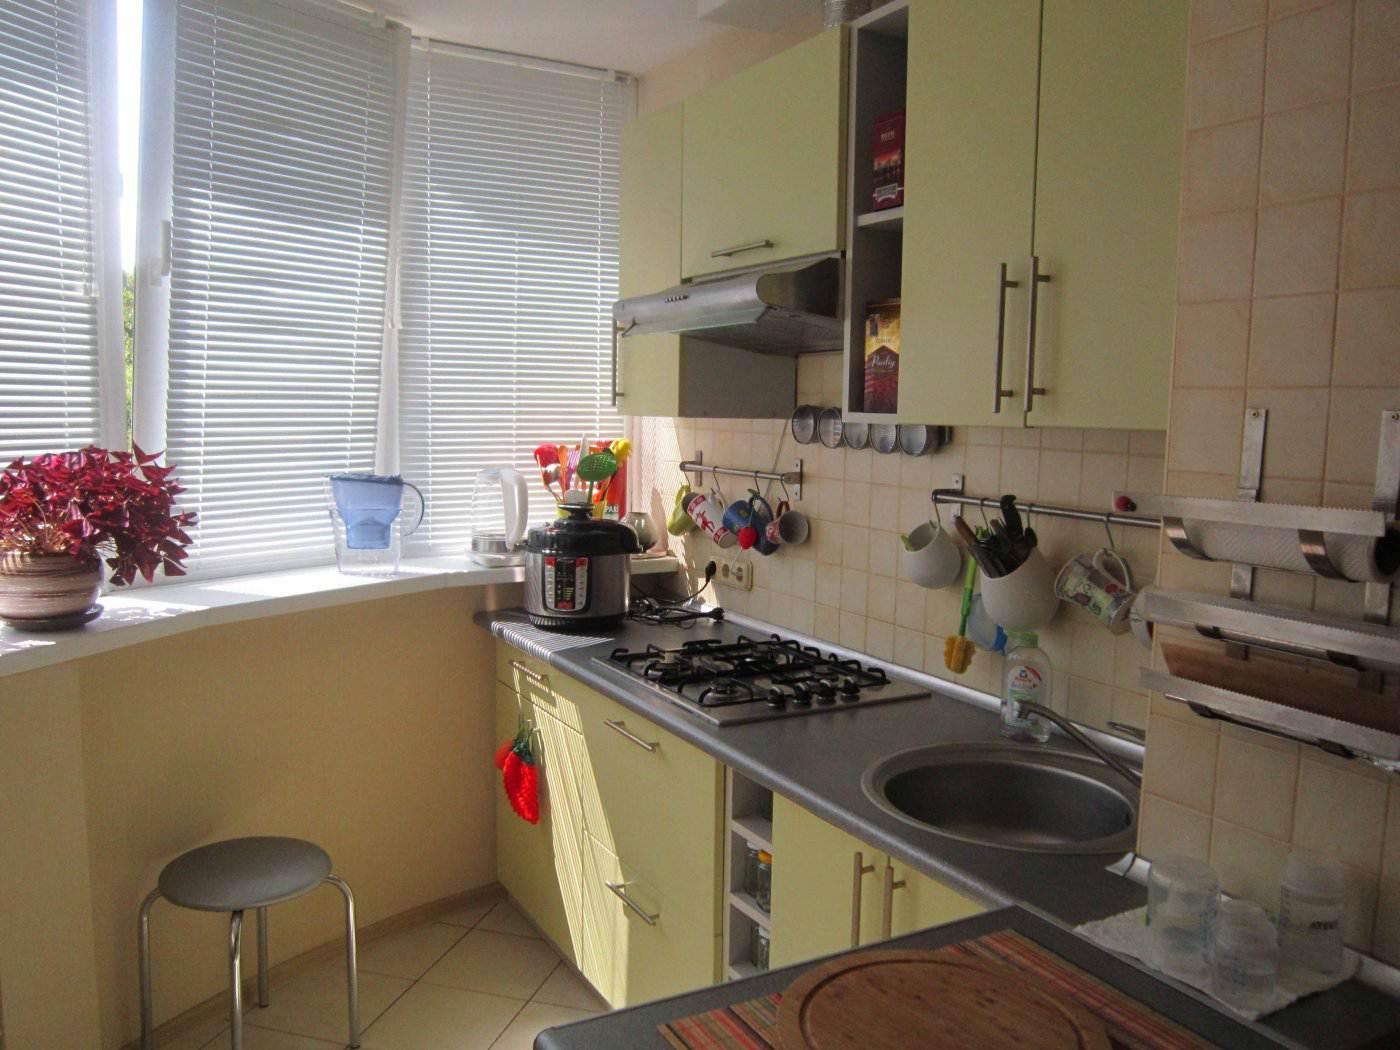 Как можно вынести кухню на балкон картинки.